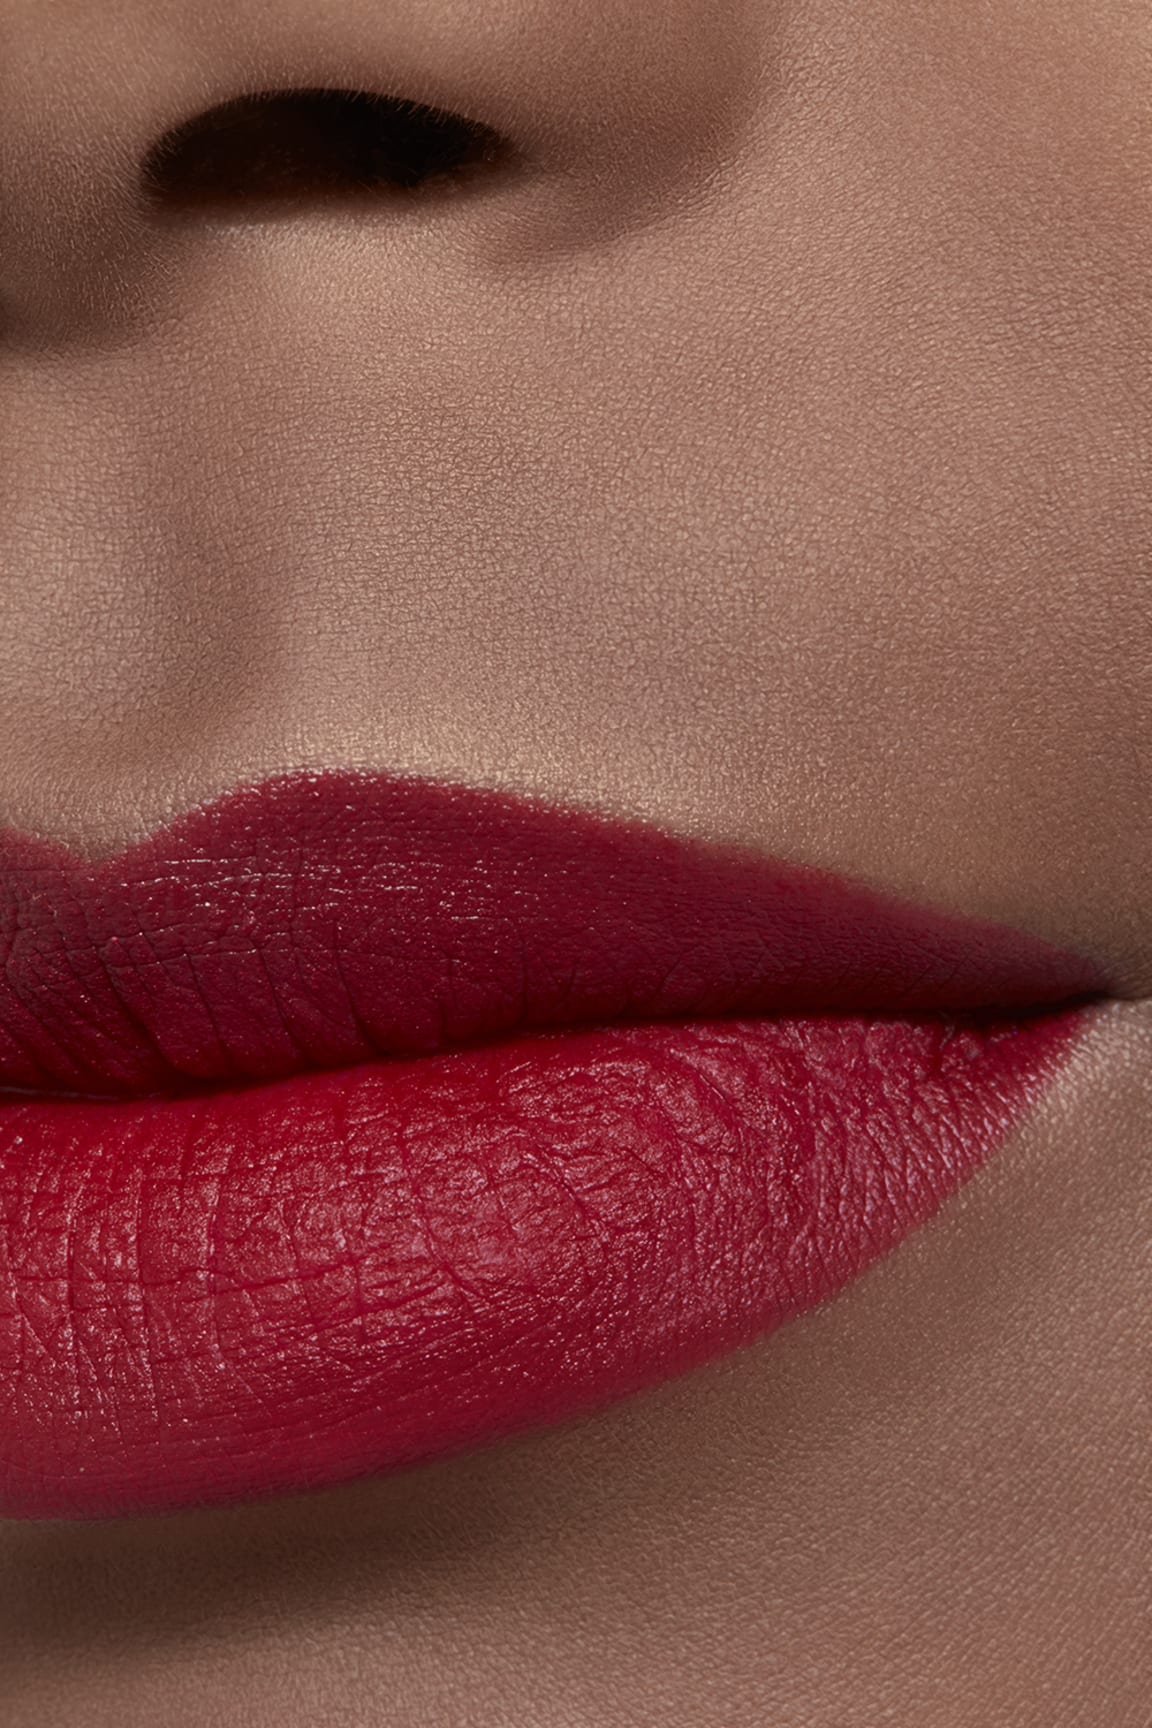 Application makeup visual 2 - ROUGE ALLURE VELVET 56 - ROUGE CHARNEL